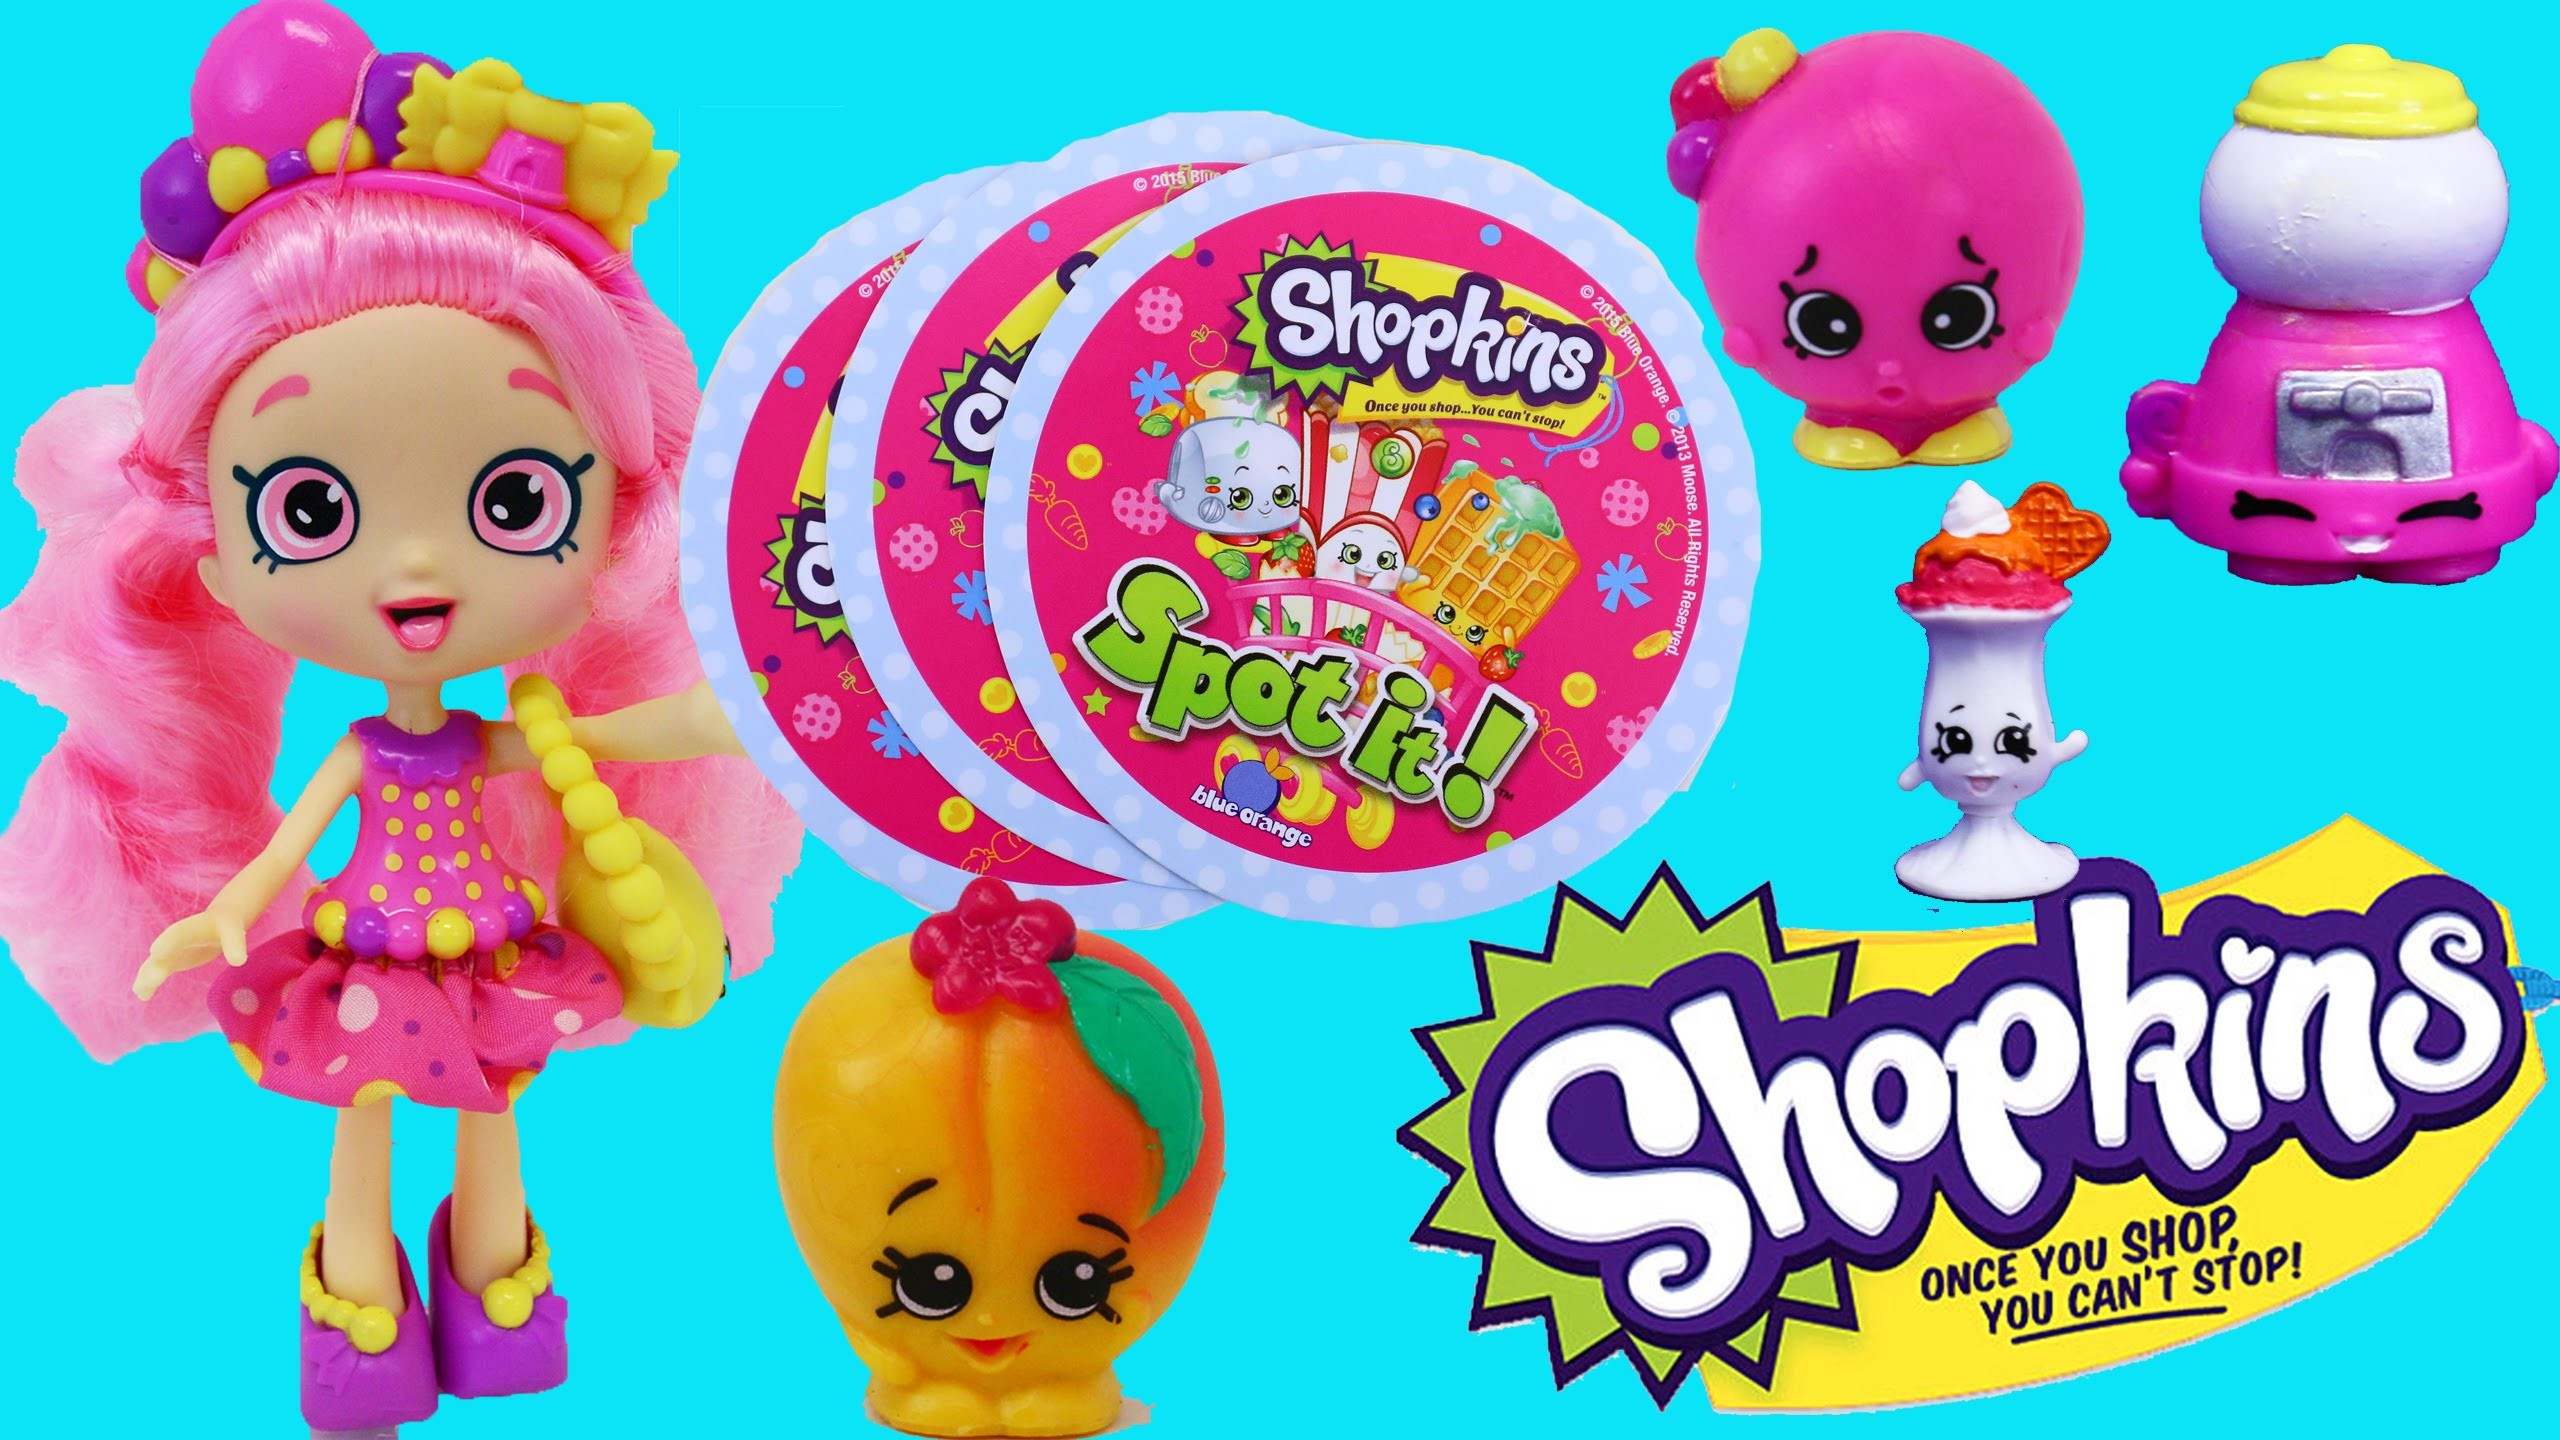 Shopkins Spot It Game Challenge & NEW Shopkins Shoppies Dolls & Surprise  Toys 12-Pack – YouTube